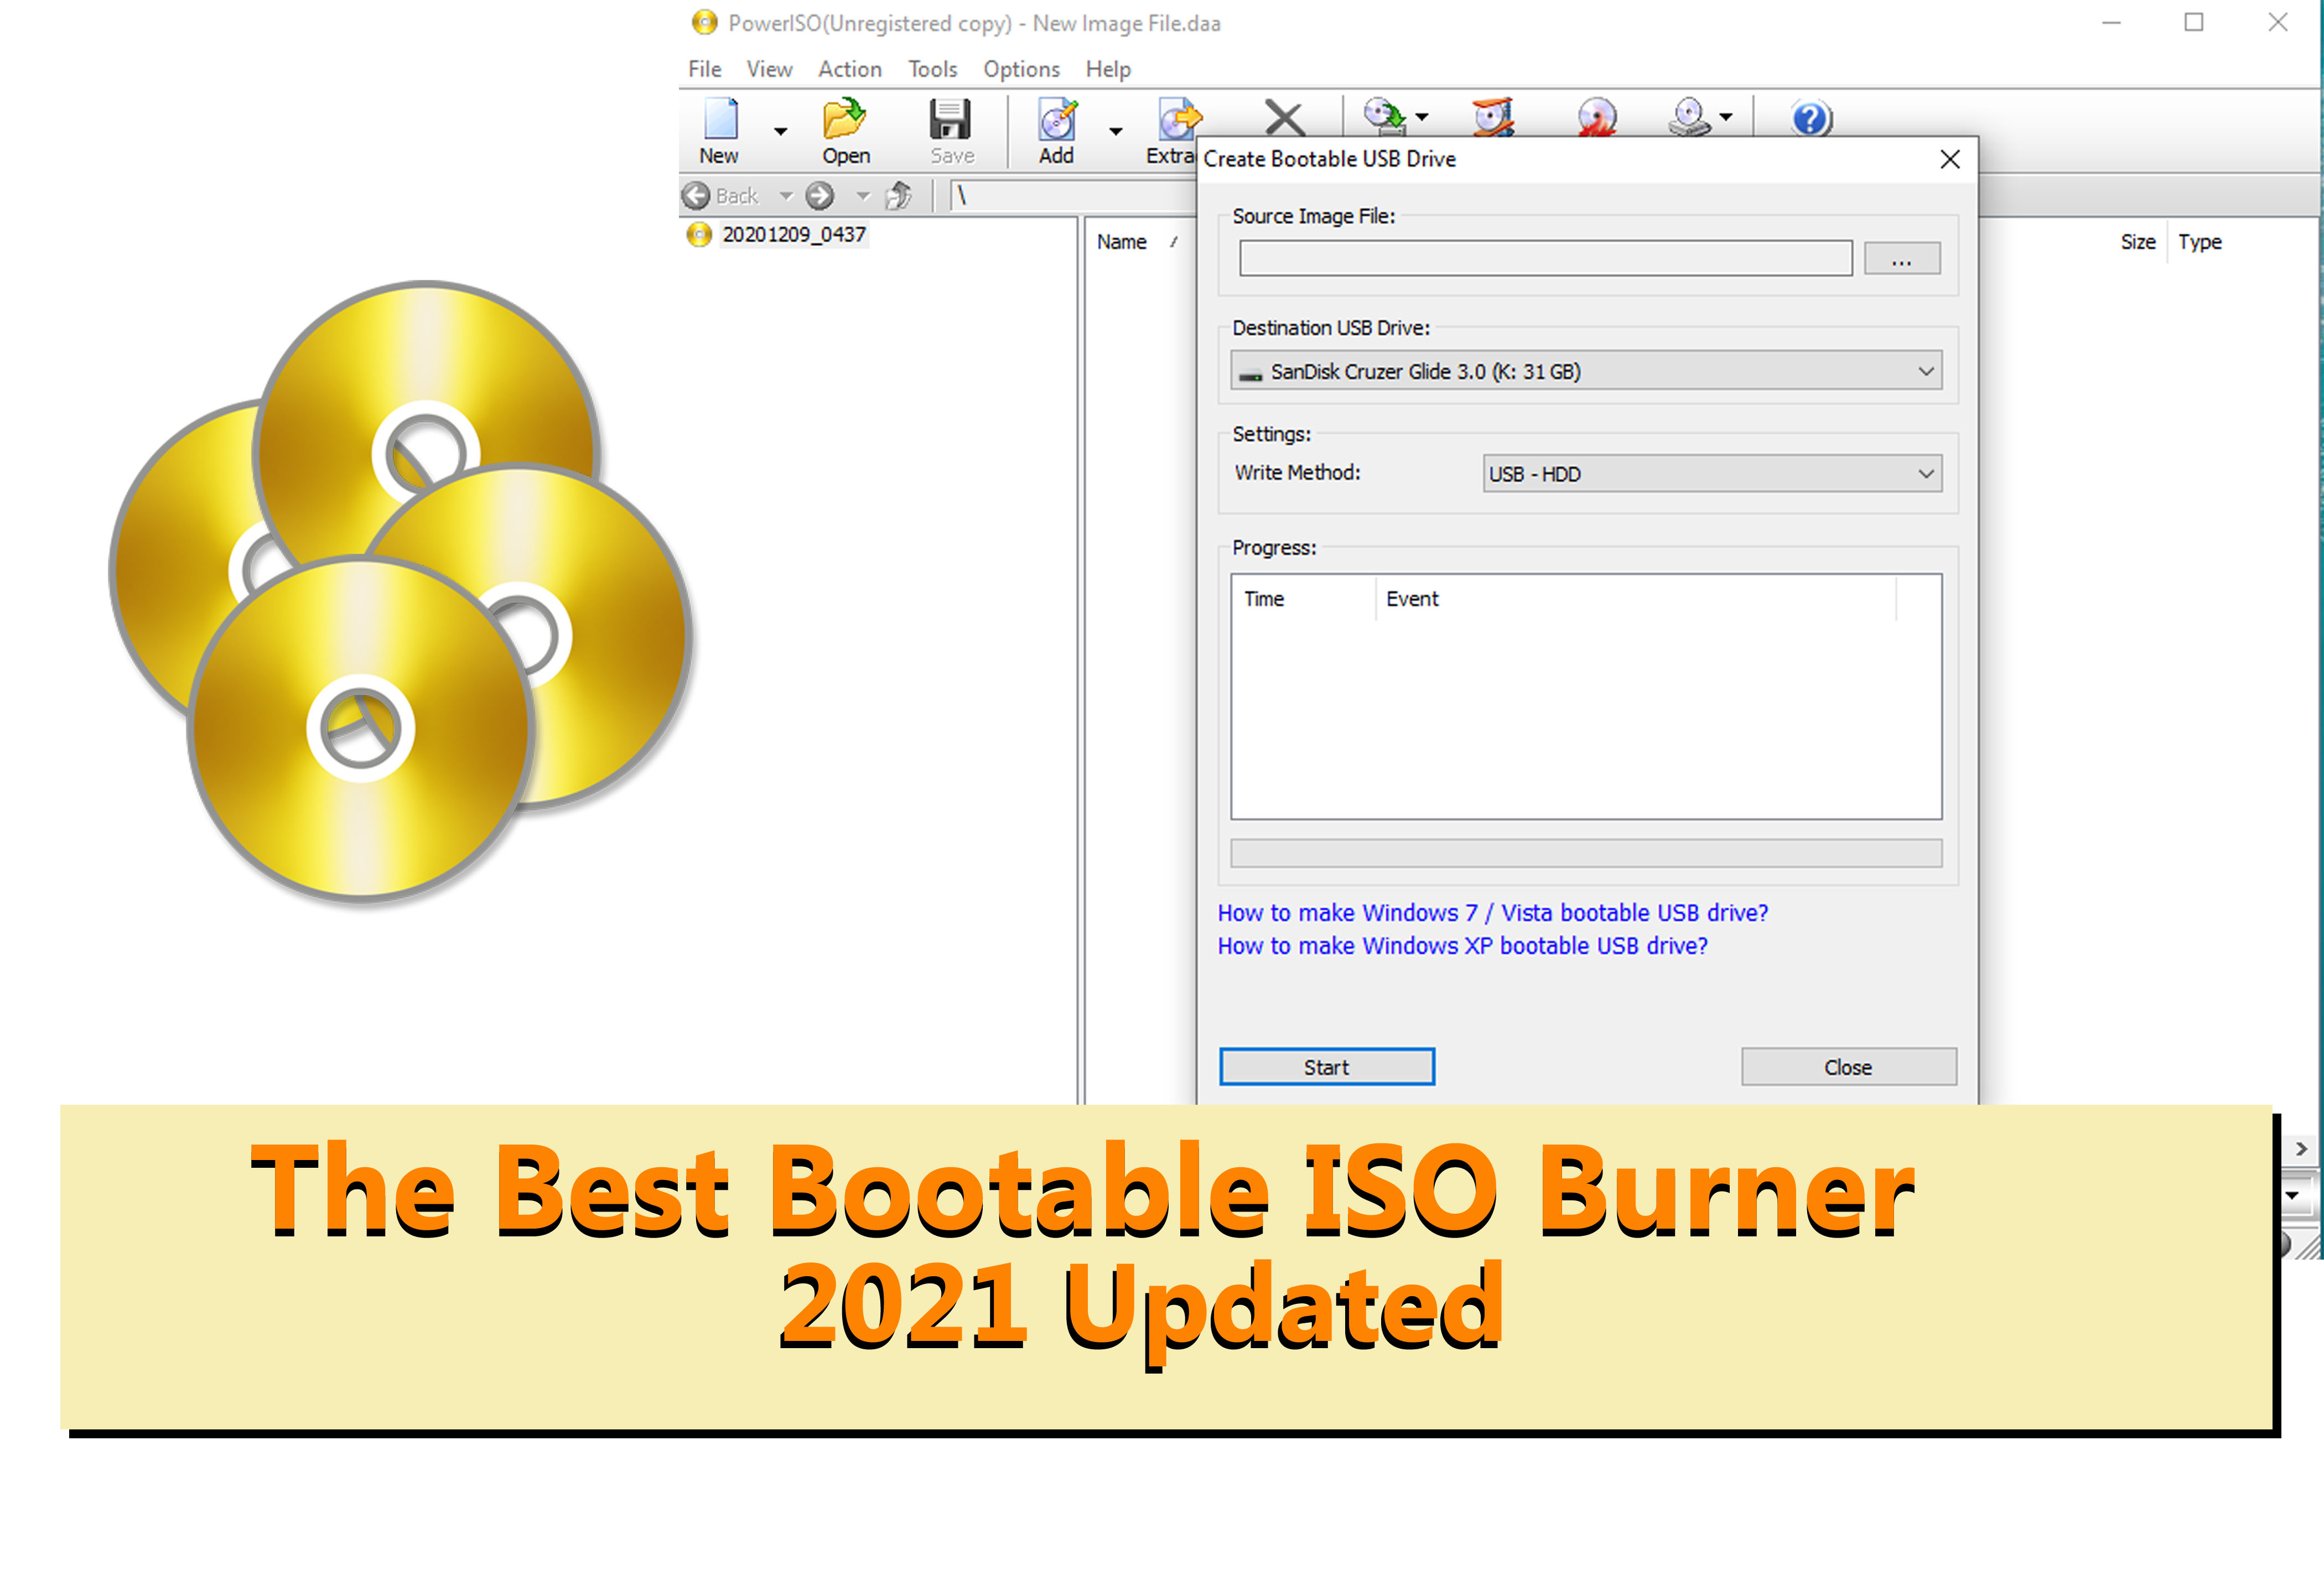 bootable ISO burner software